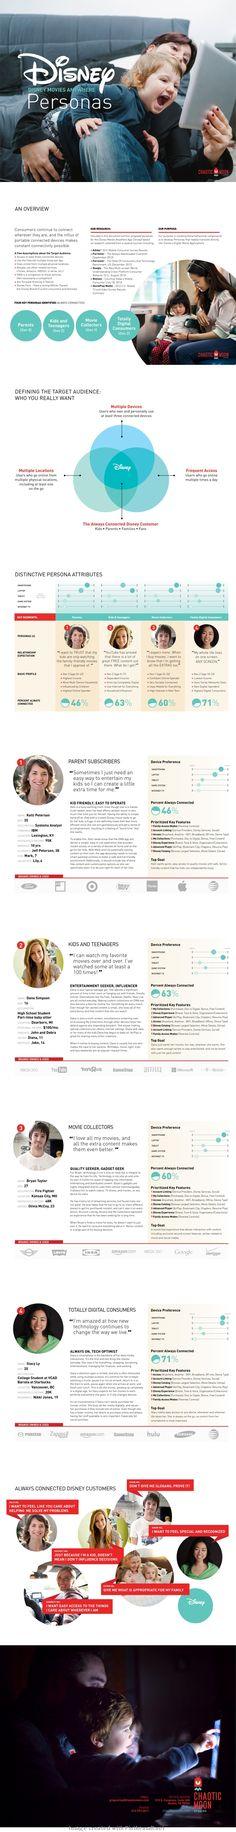 137 best Diagrams \ Visualisation images on Pinterest Customer - bid templates